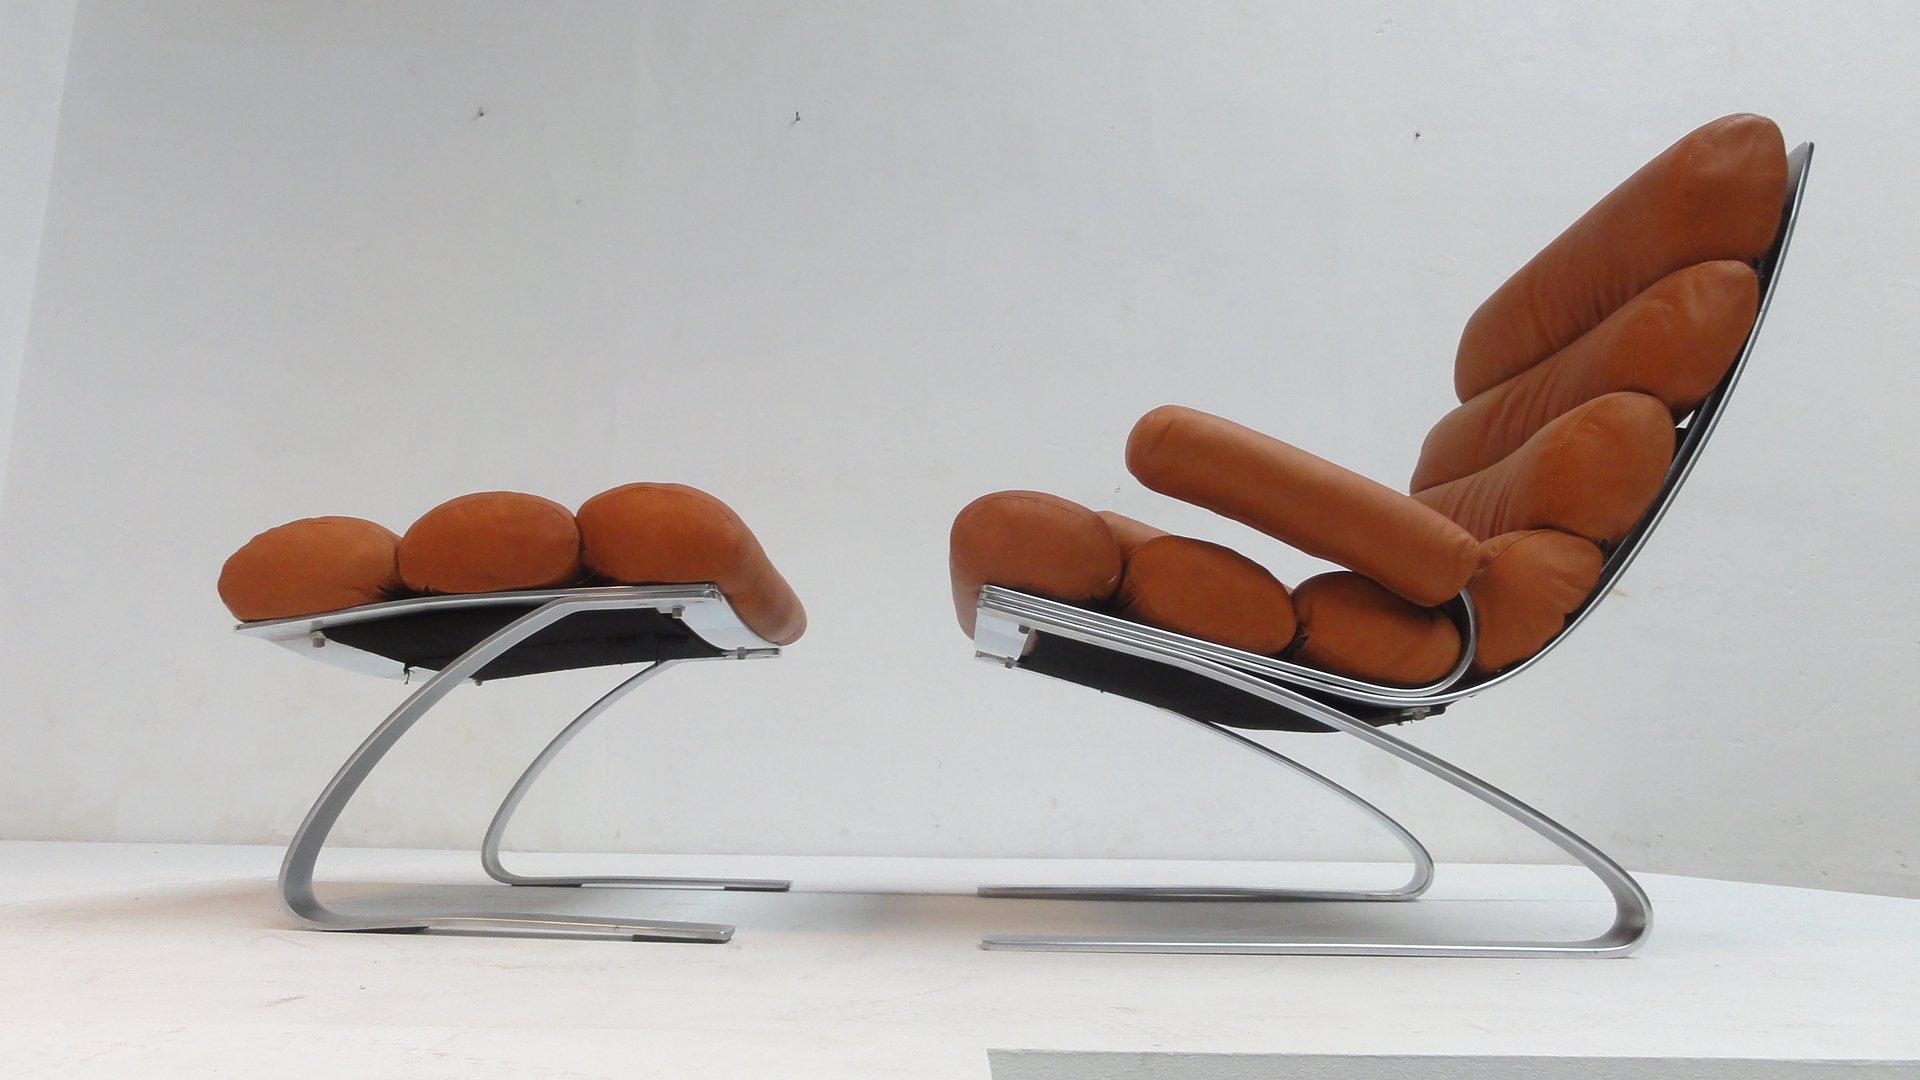 sinus lounge chair by reinhold adolf hans j rgen schr pfer for cor germany 1970s for sale at. Black Bedroom Furniture Sets. Home Design Ideas